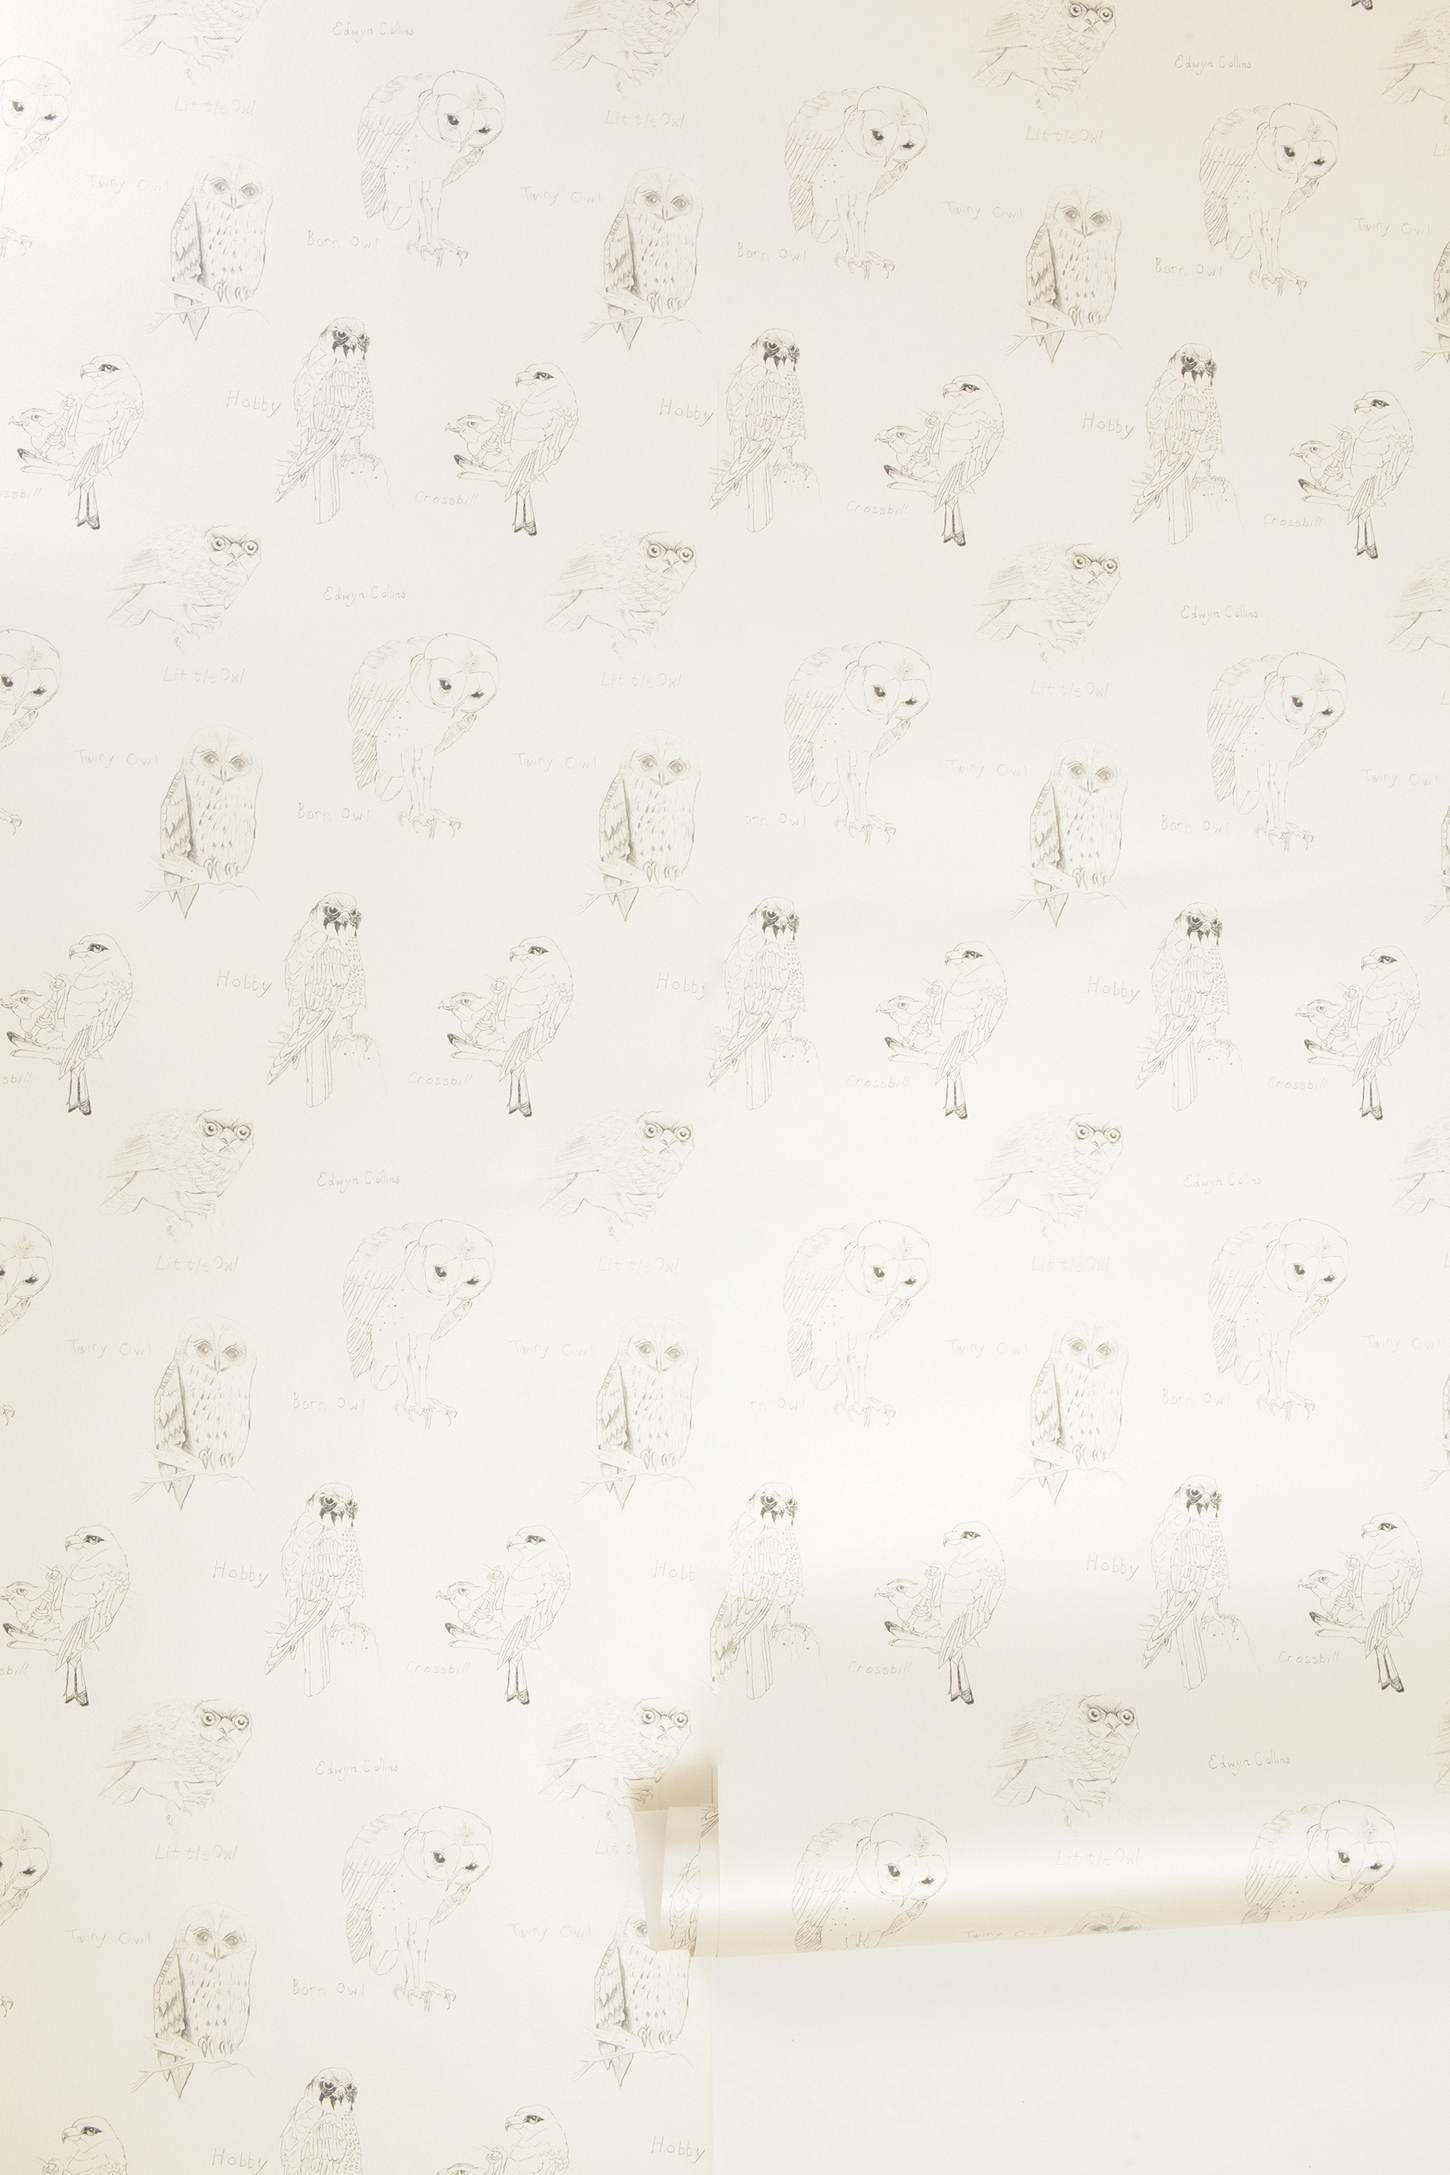 Accent Wall In A Bedroom Or Bathroom Owl Wallpaper Wallpaper Home Wallpaper